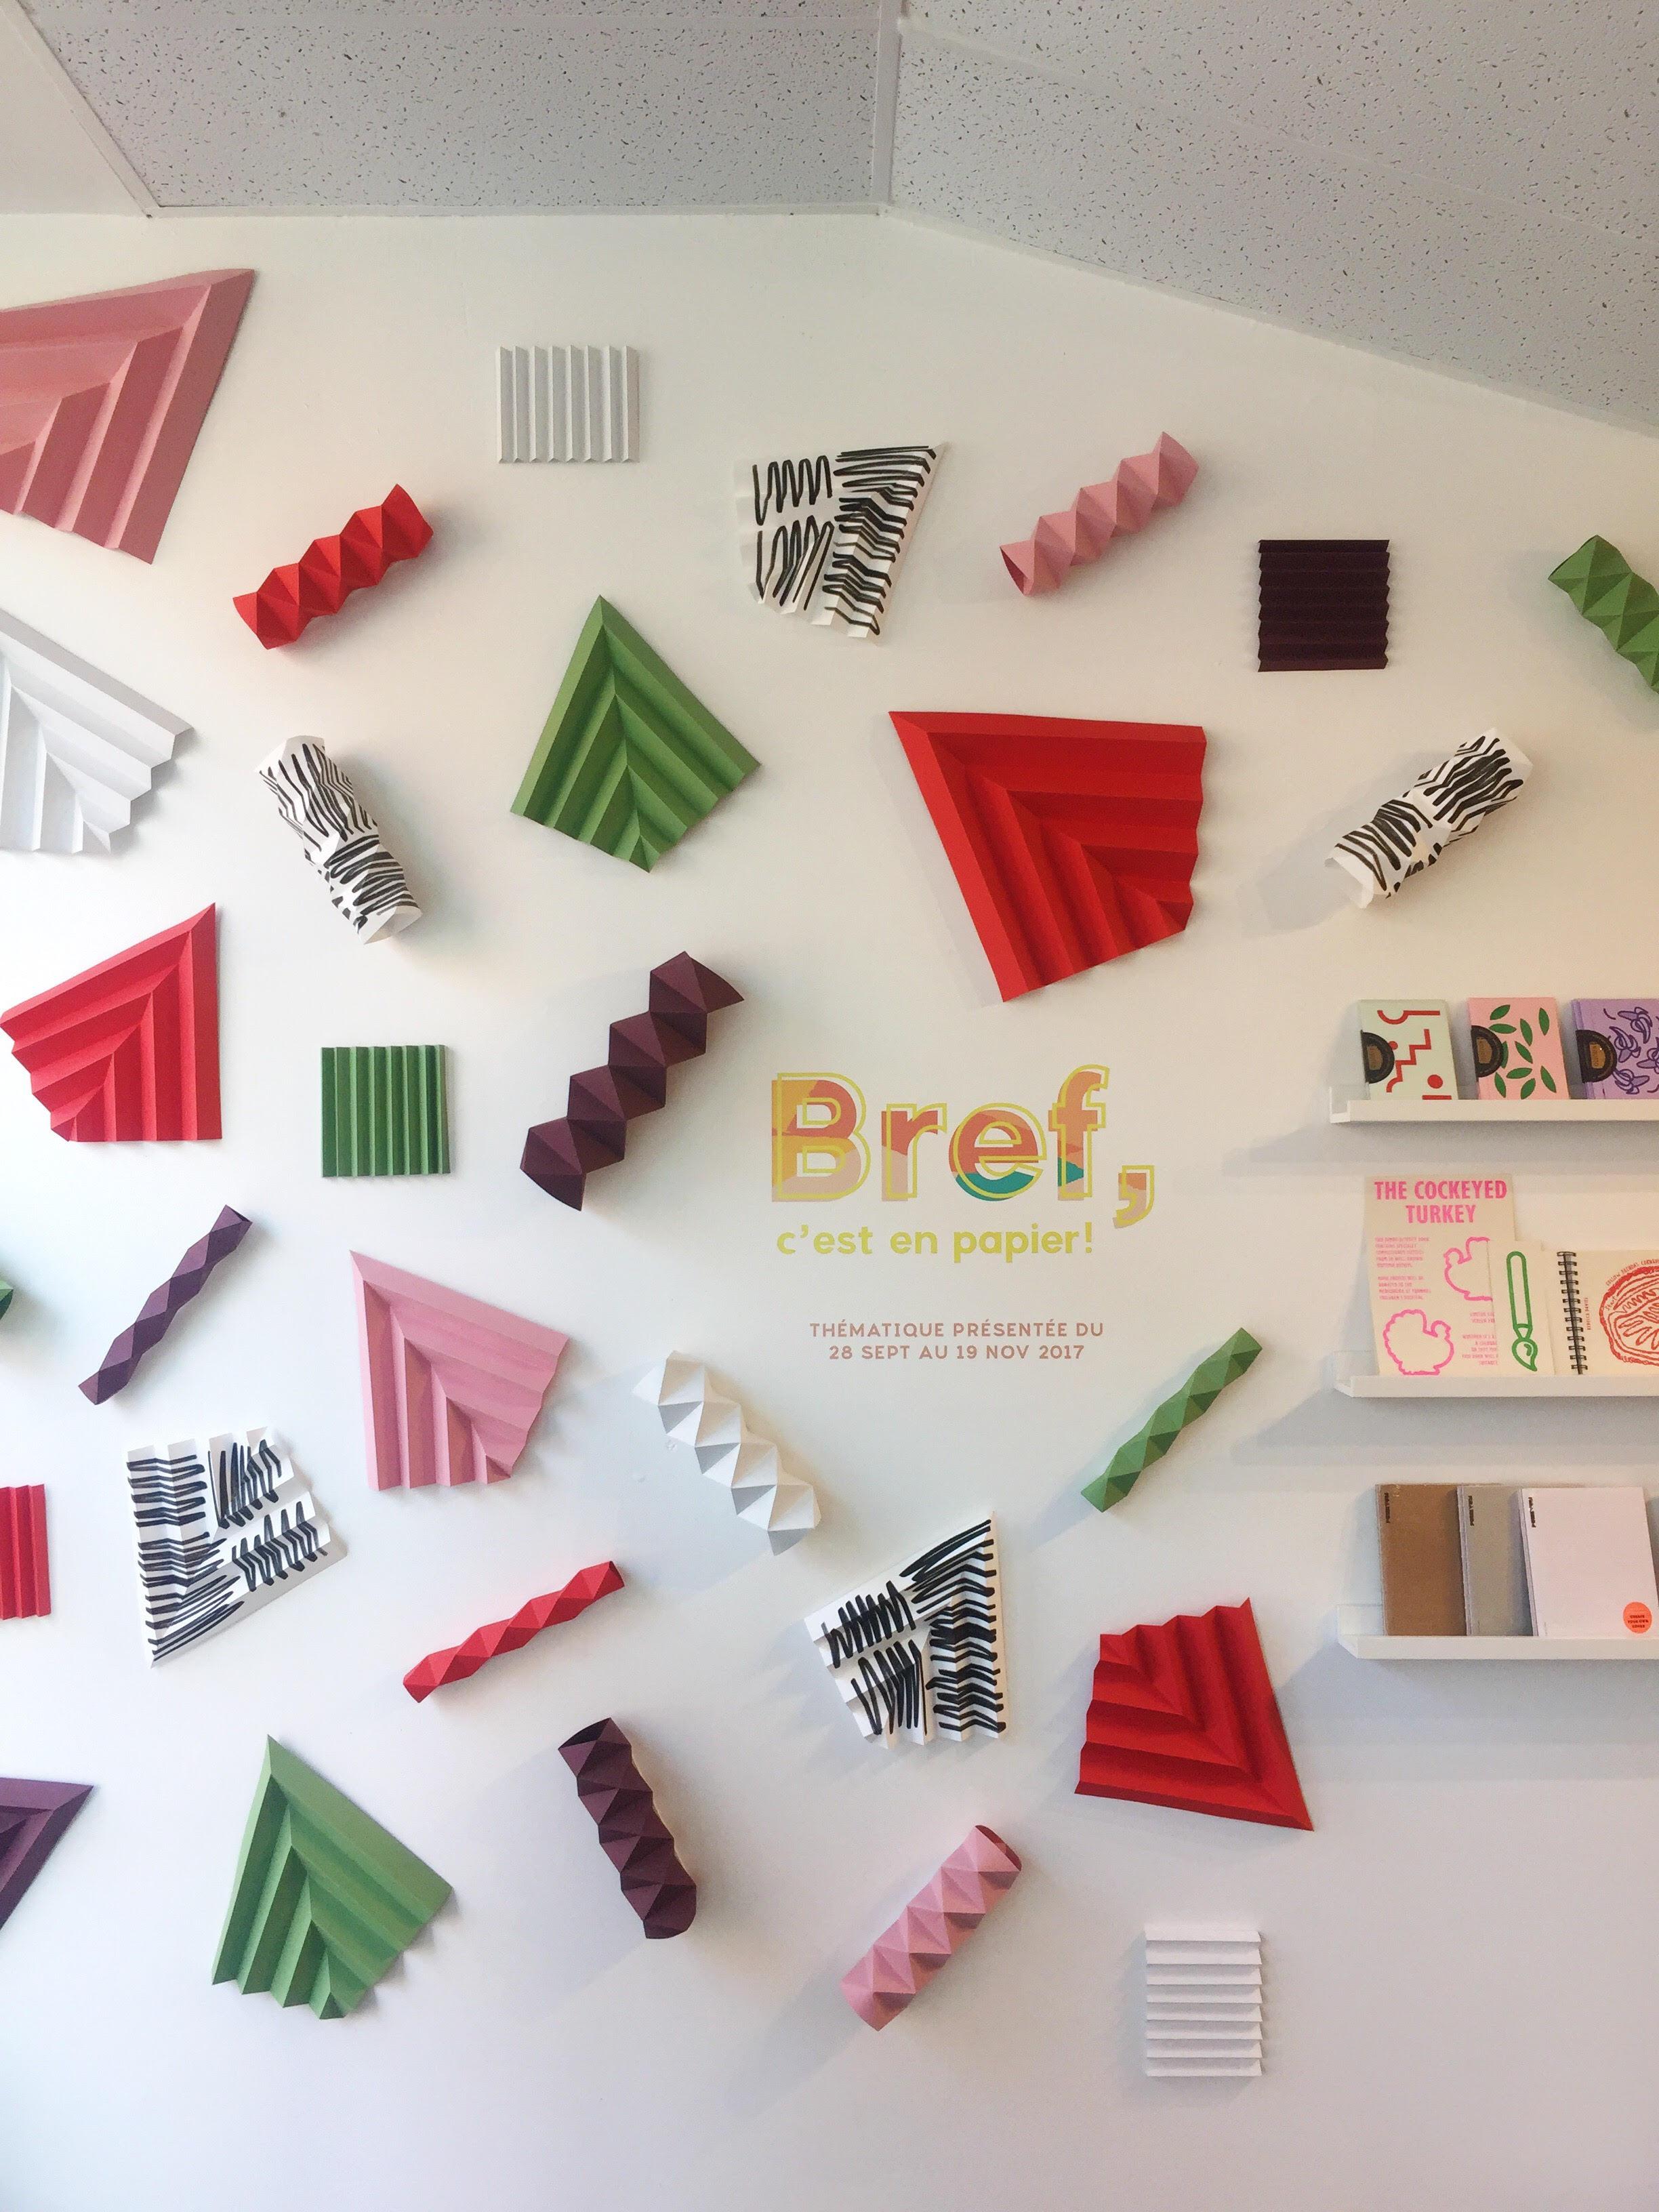 pauline-loctin-art-origami-installation-mural-bref-miss-cloudy-murale-paper.jpg